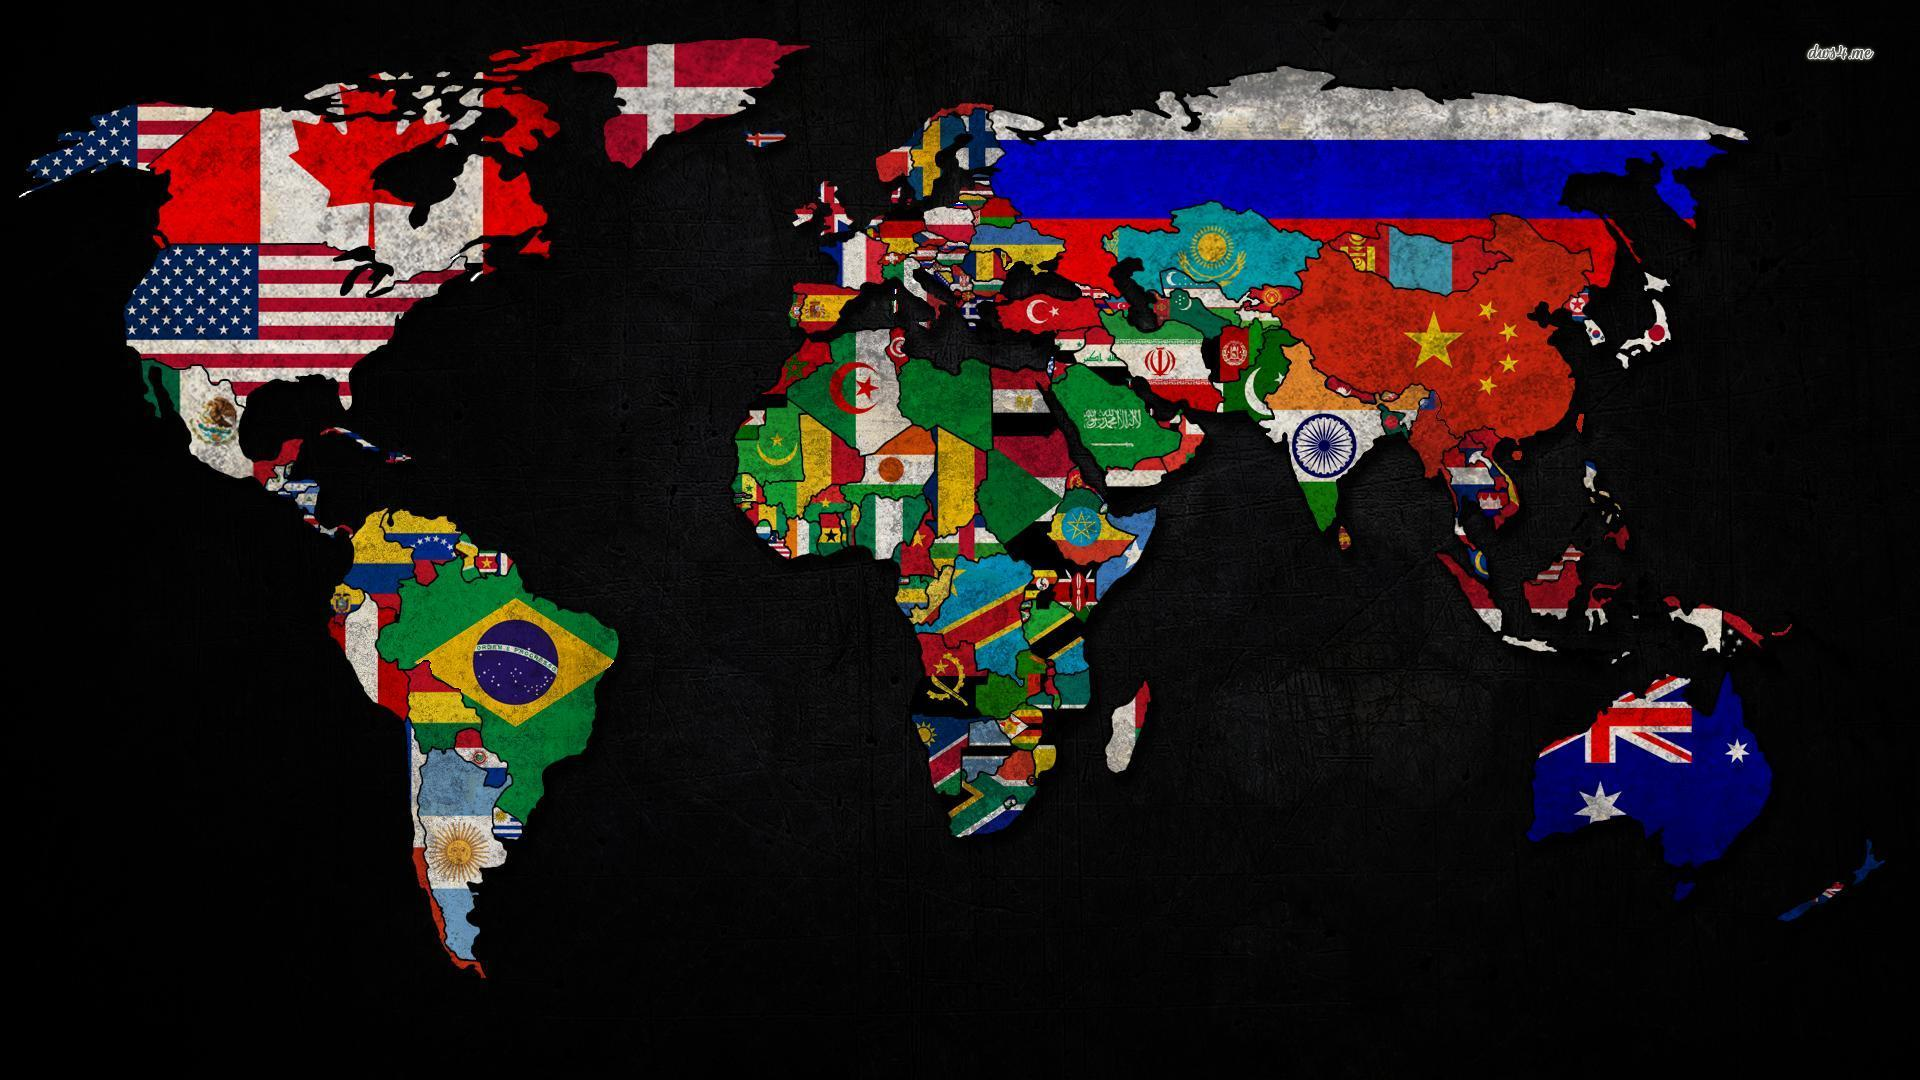 map of world image